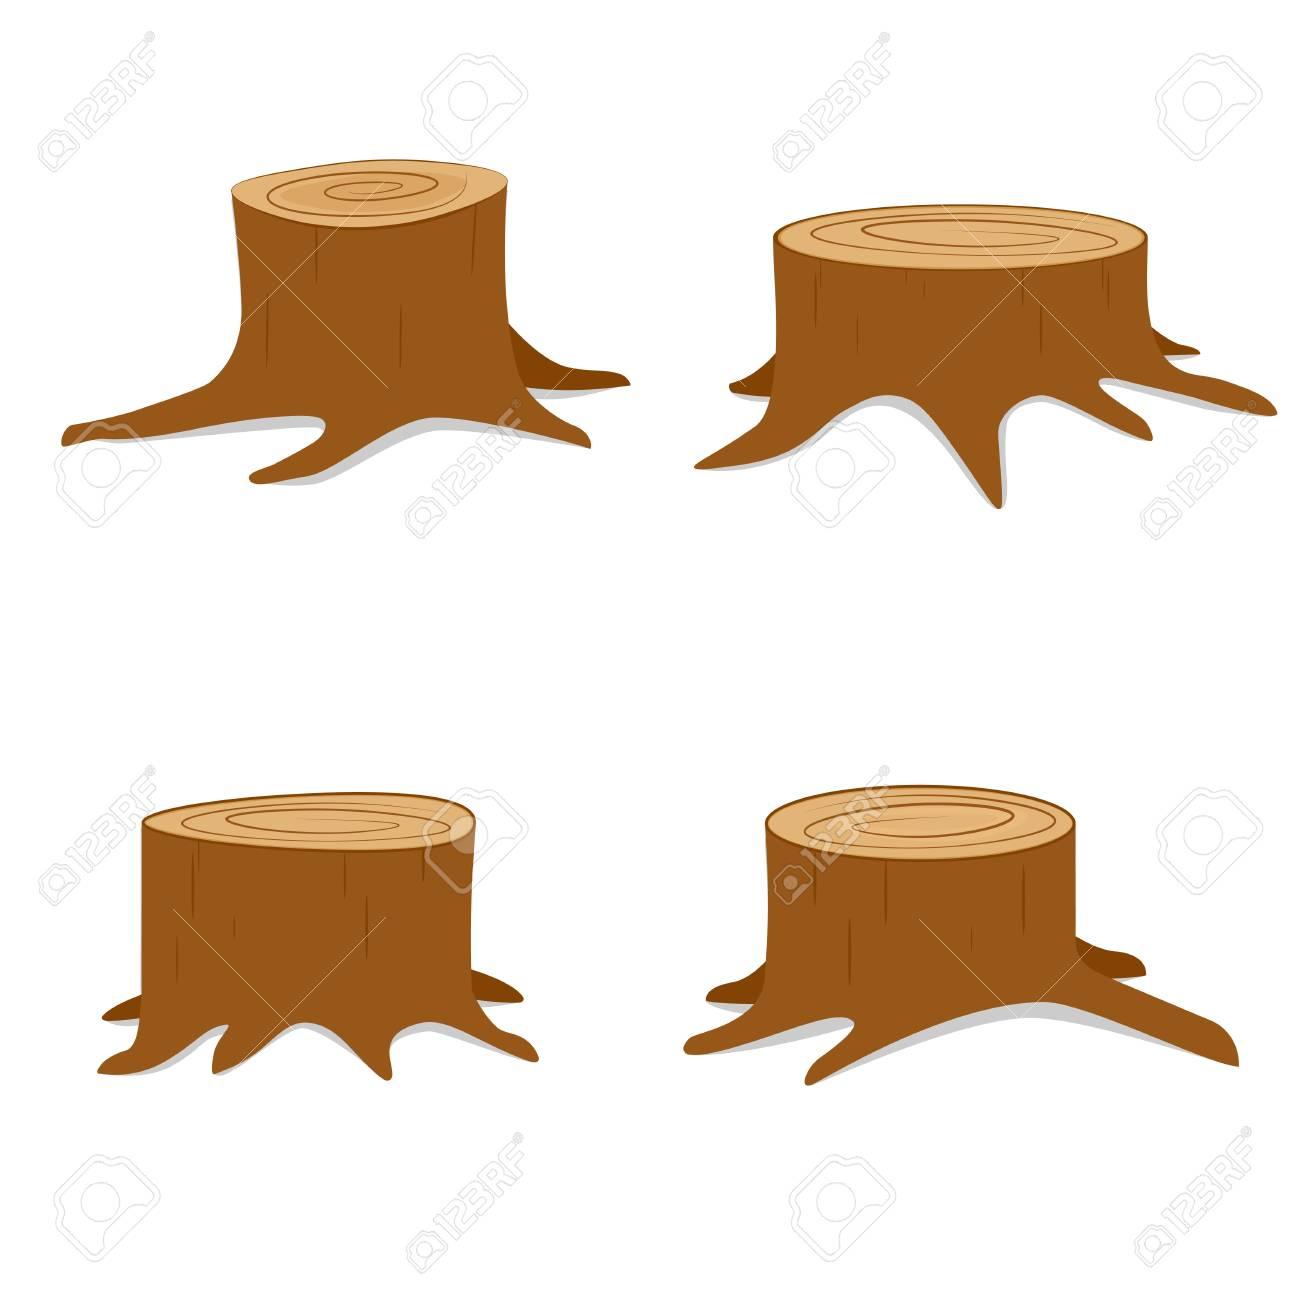 Tree stump set. Vector illustration isolated on white background - 92684411